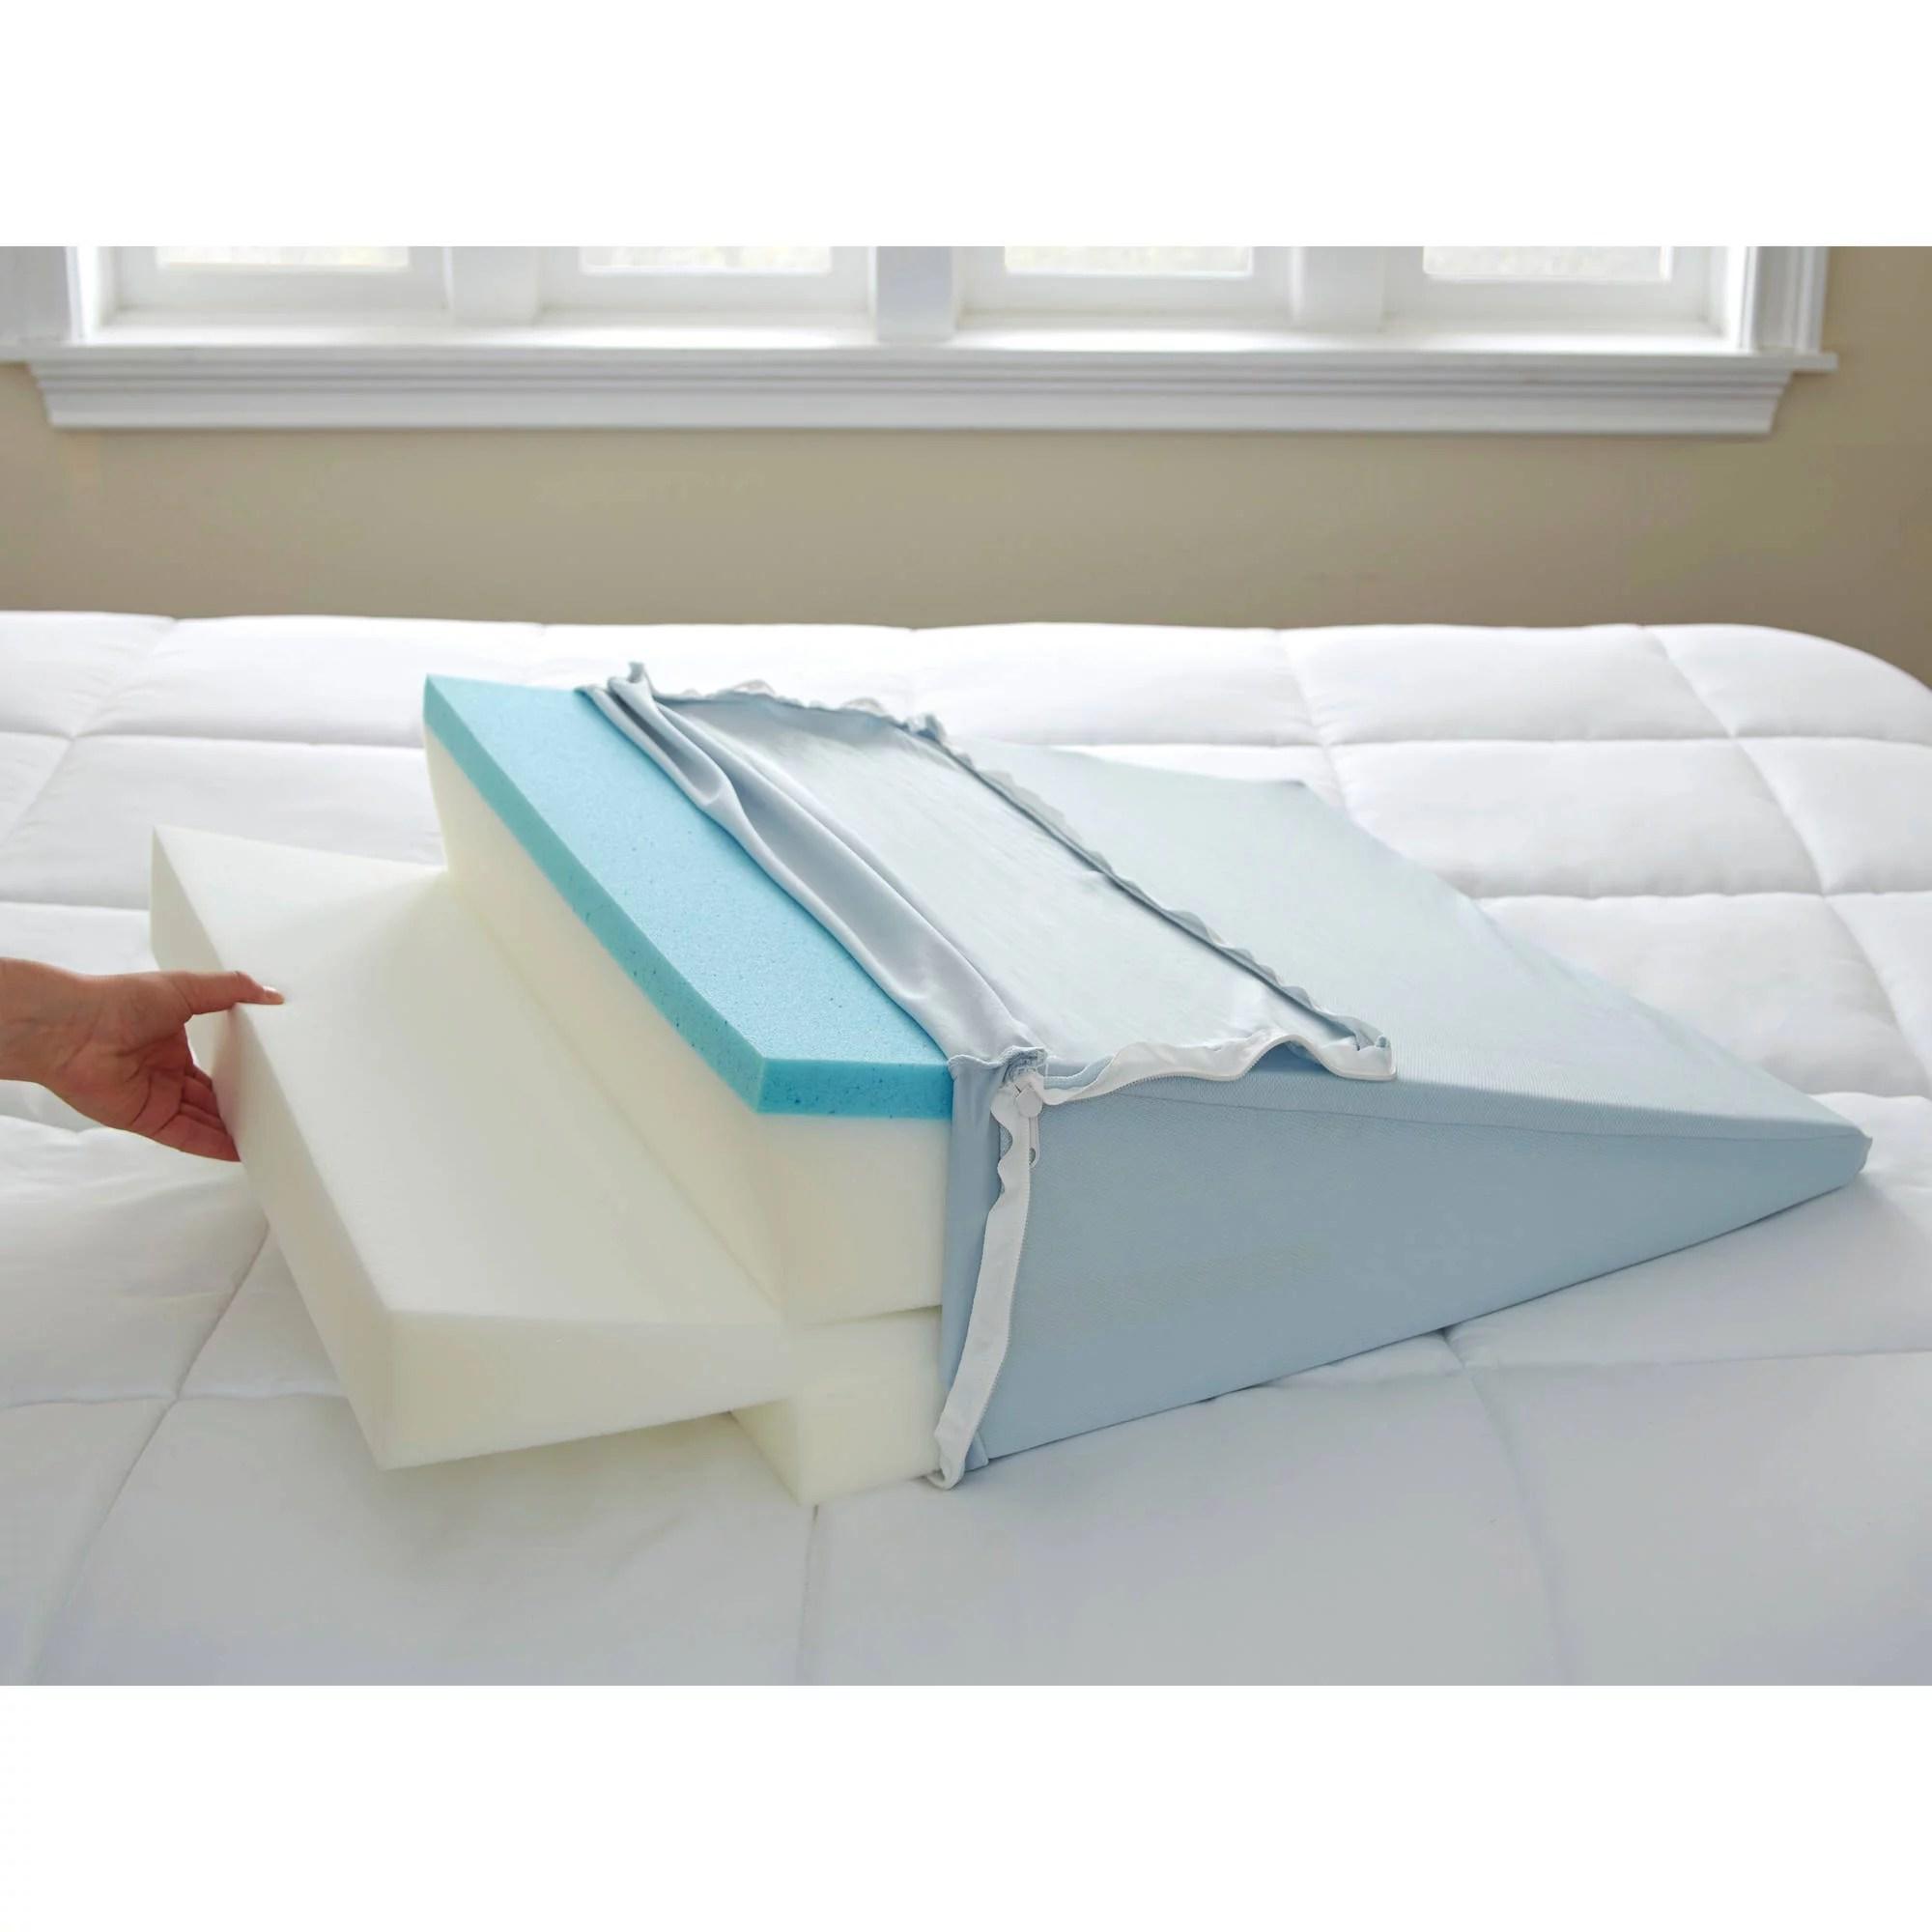 thomasville adjustable gel memory foam wedge bed pillow